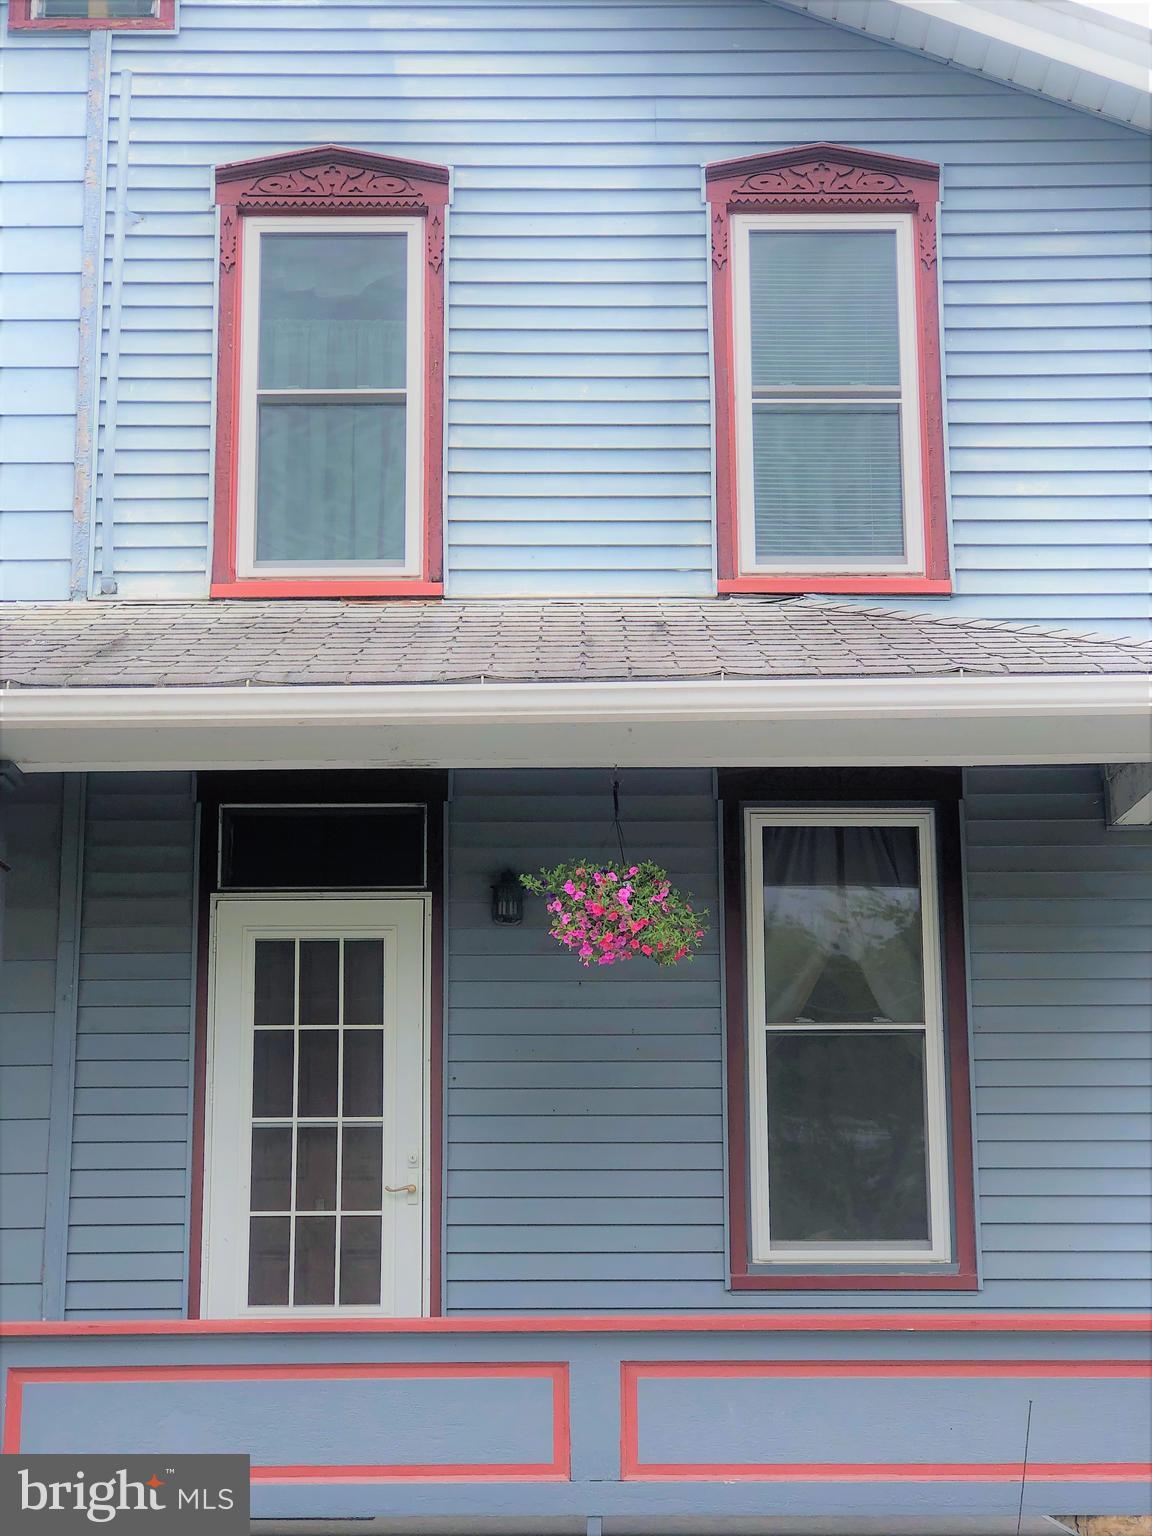 115 W MCCLURE STREET, NEW BLOOMFIELD, PA 17068